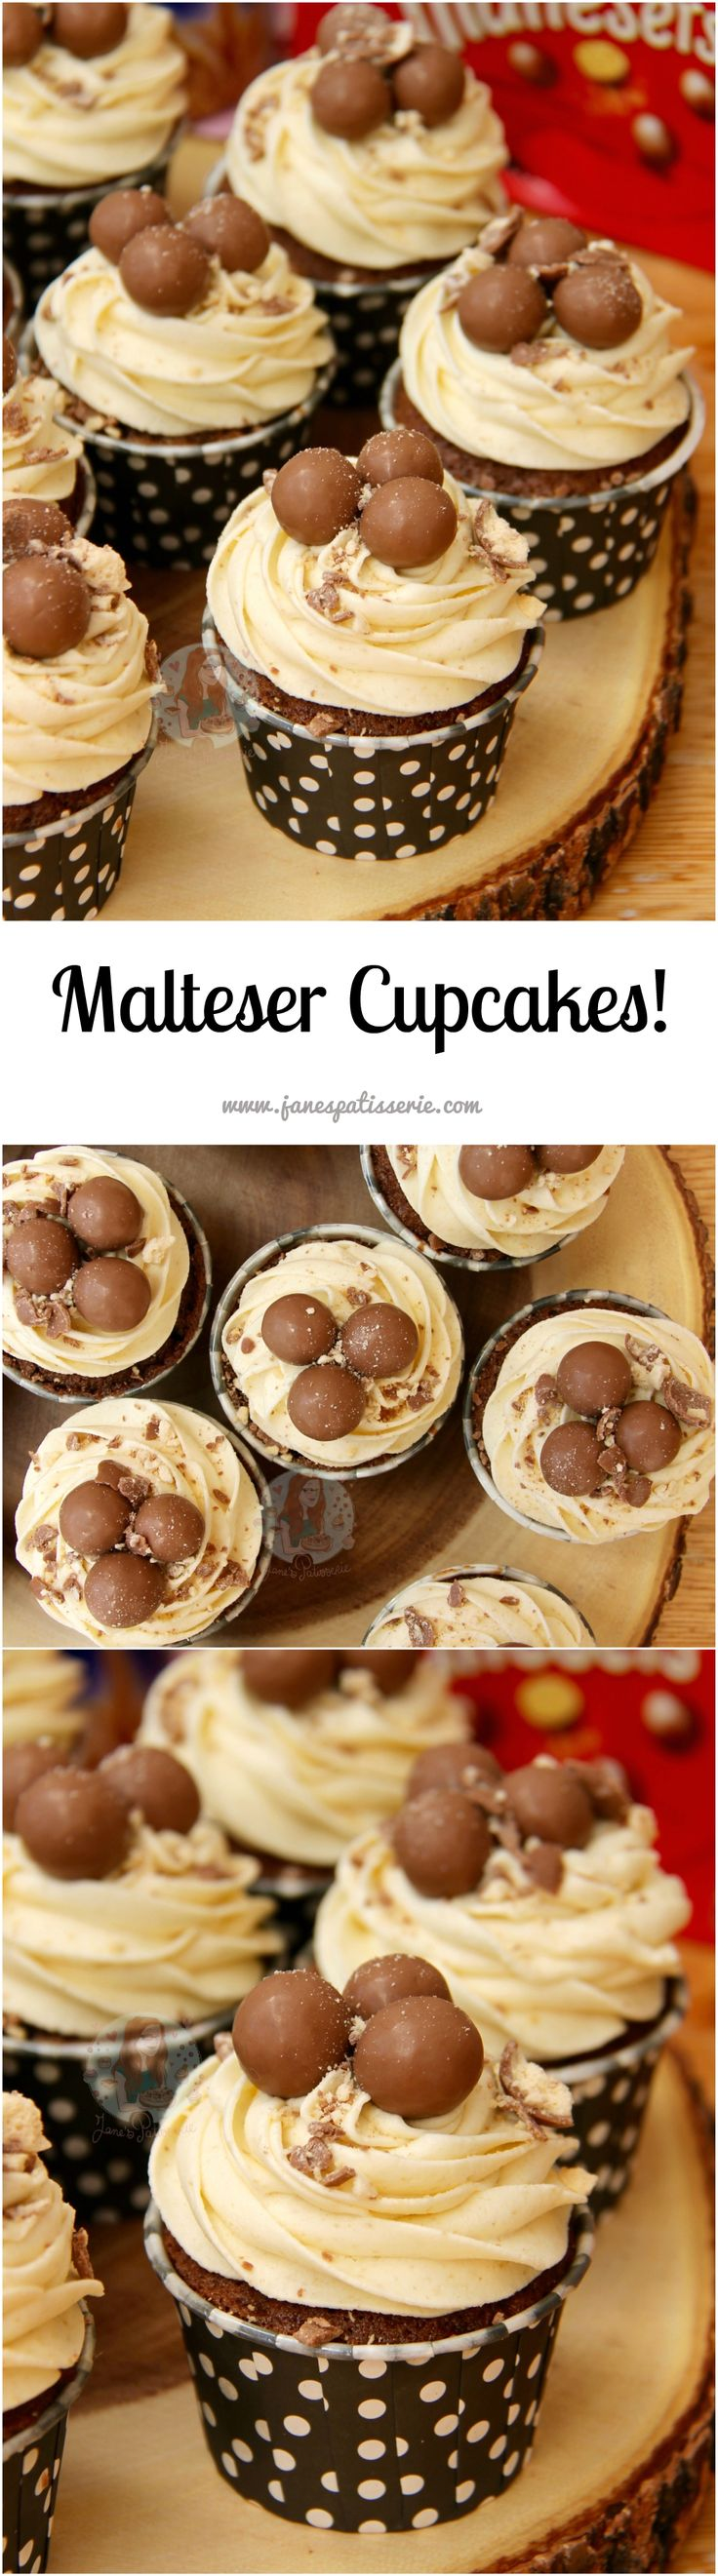 Malteser Cupcakes!!